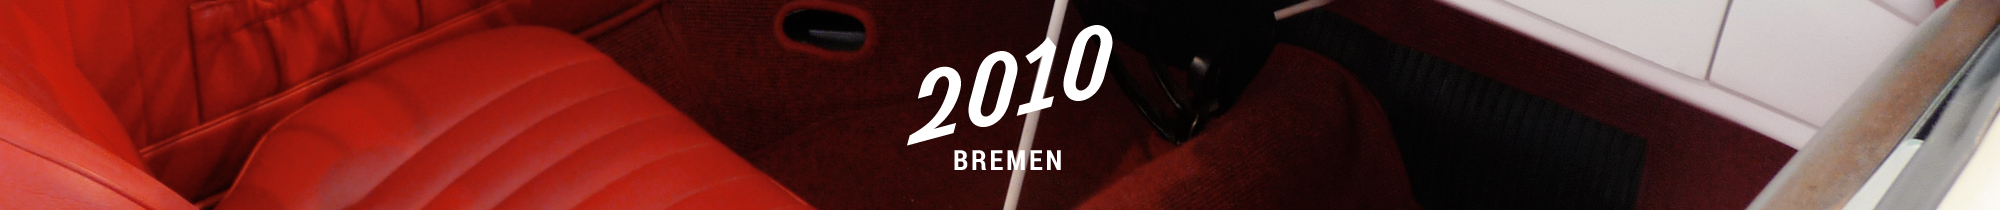 2010-bremen-slidi-03